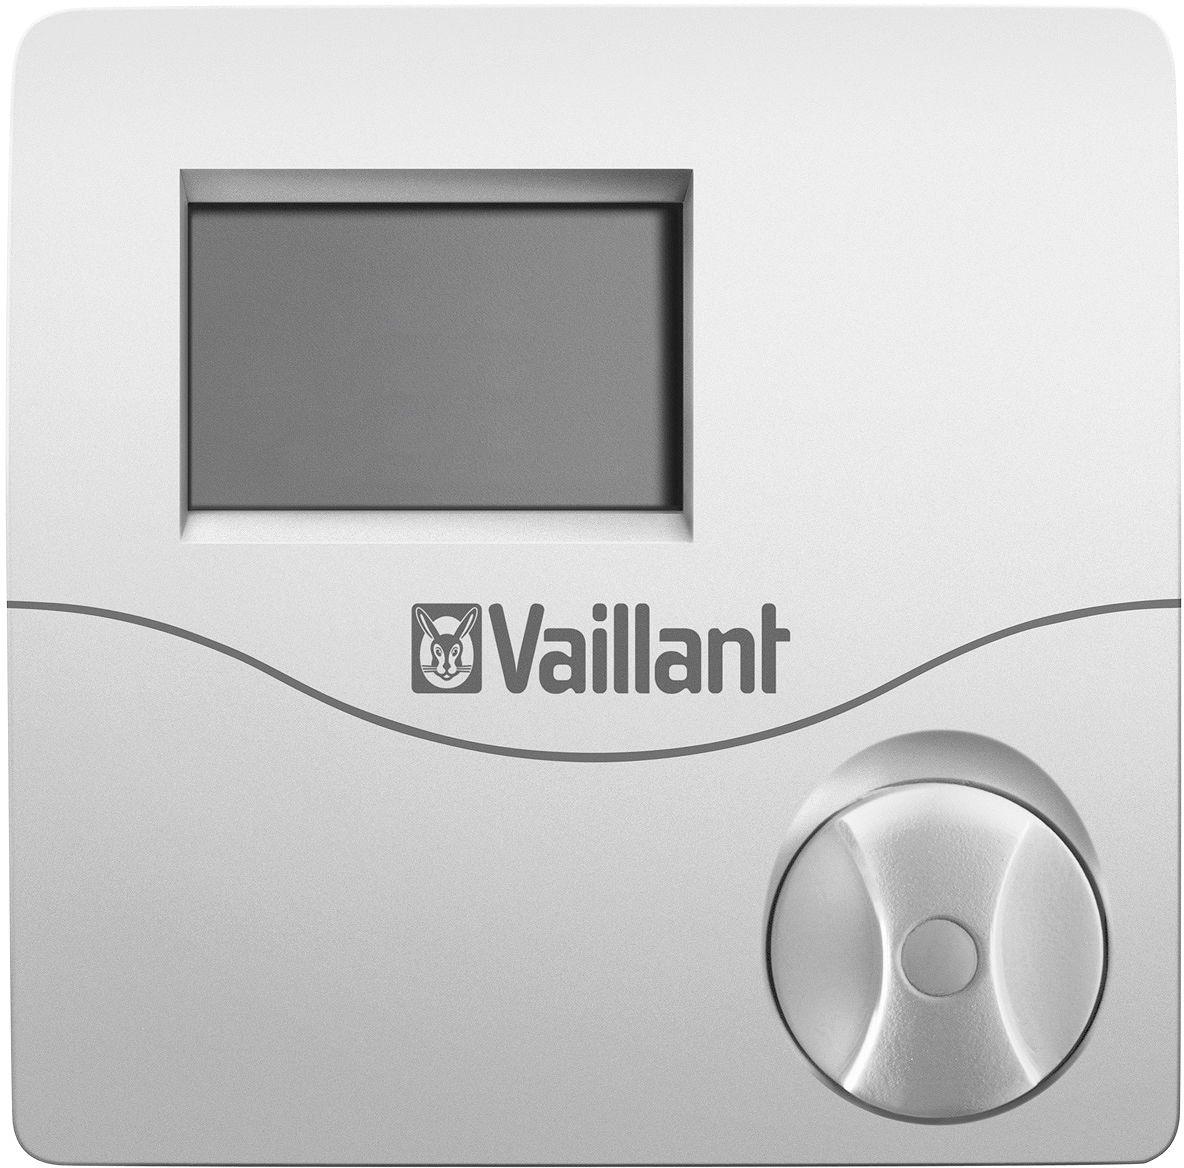 AFSTANDSBEDIEN.VR81/2 VAIL.1-2 CIRCUIT